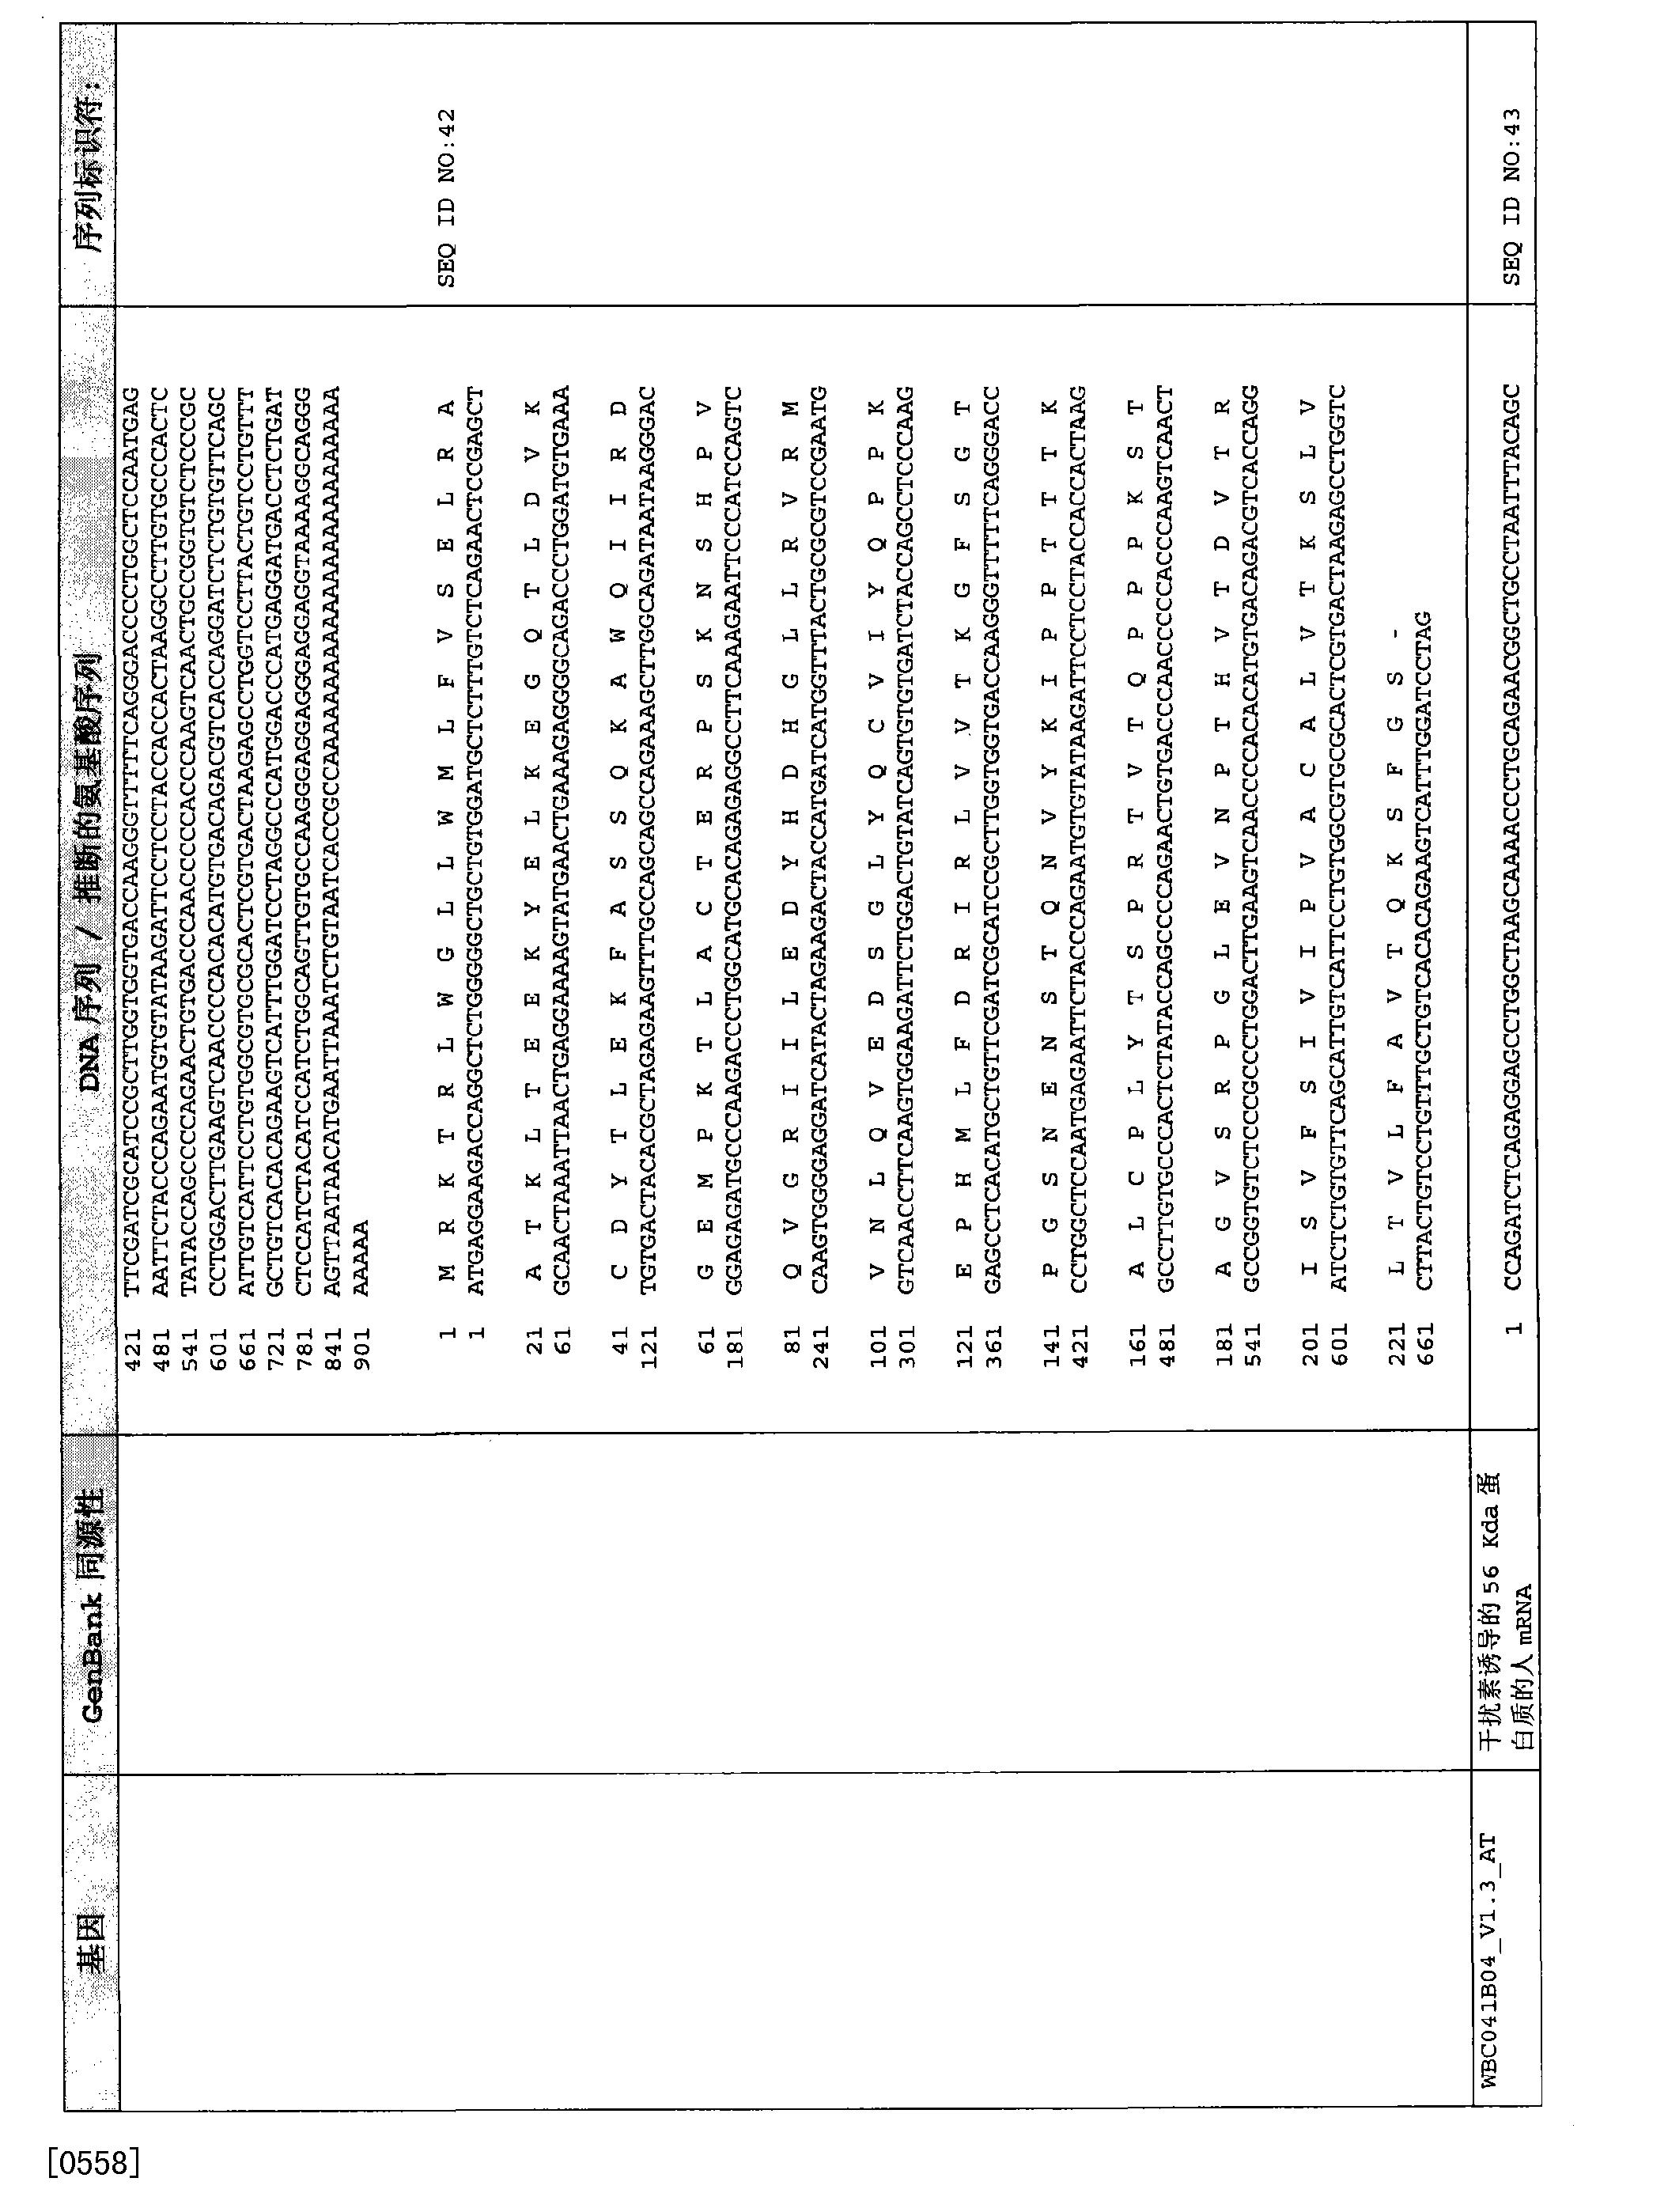 CN101065502B - Microarray-mediated diagnosis of herpes virus